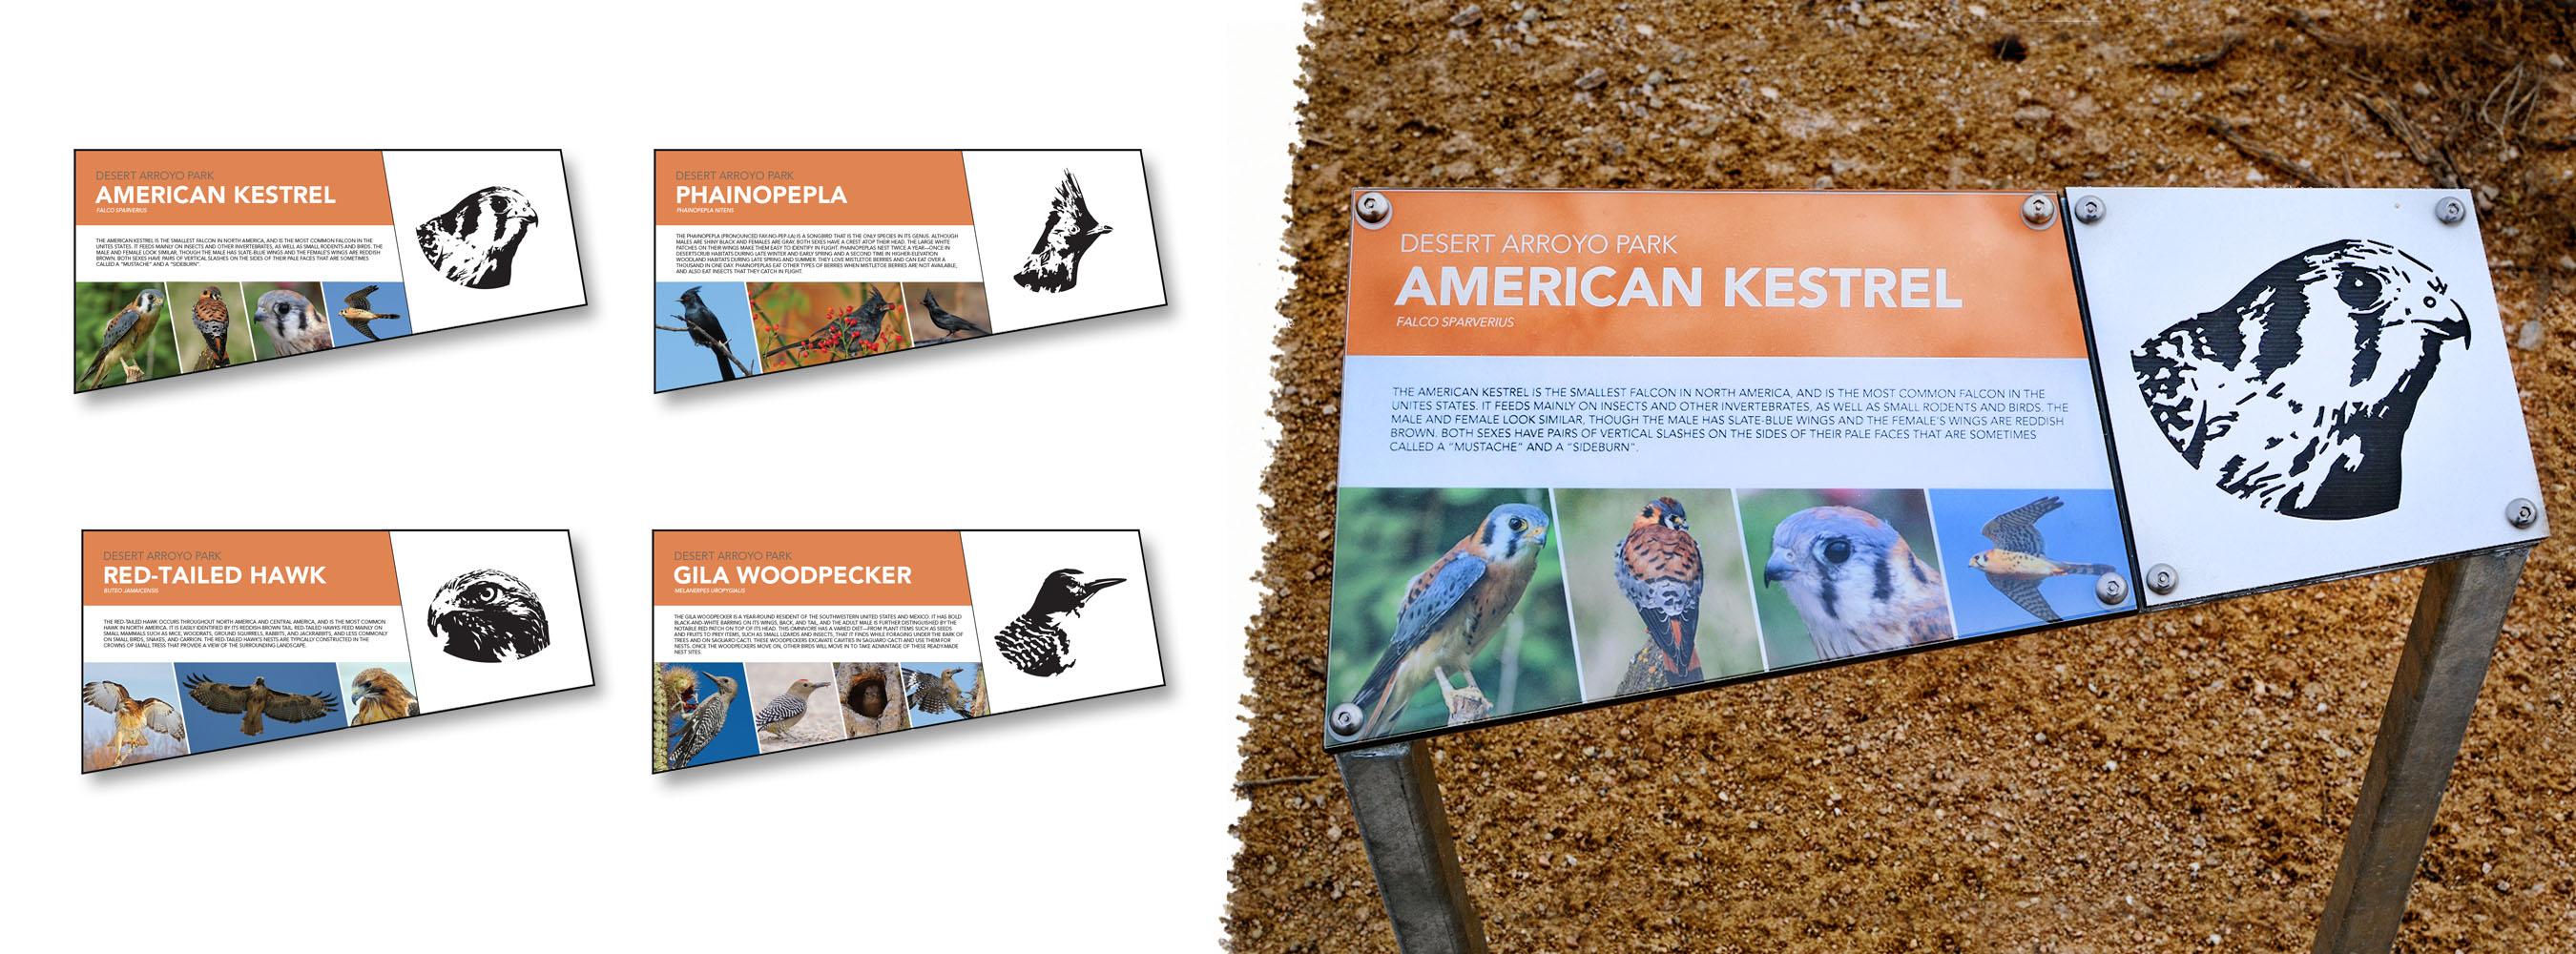 Avian signage